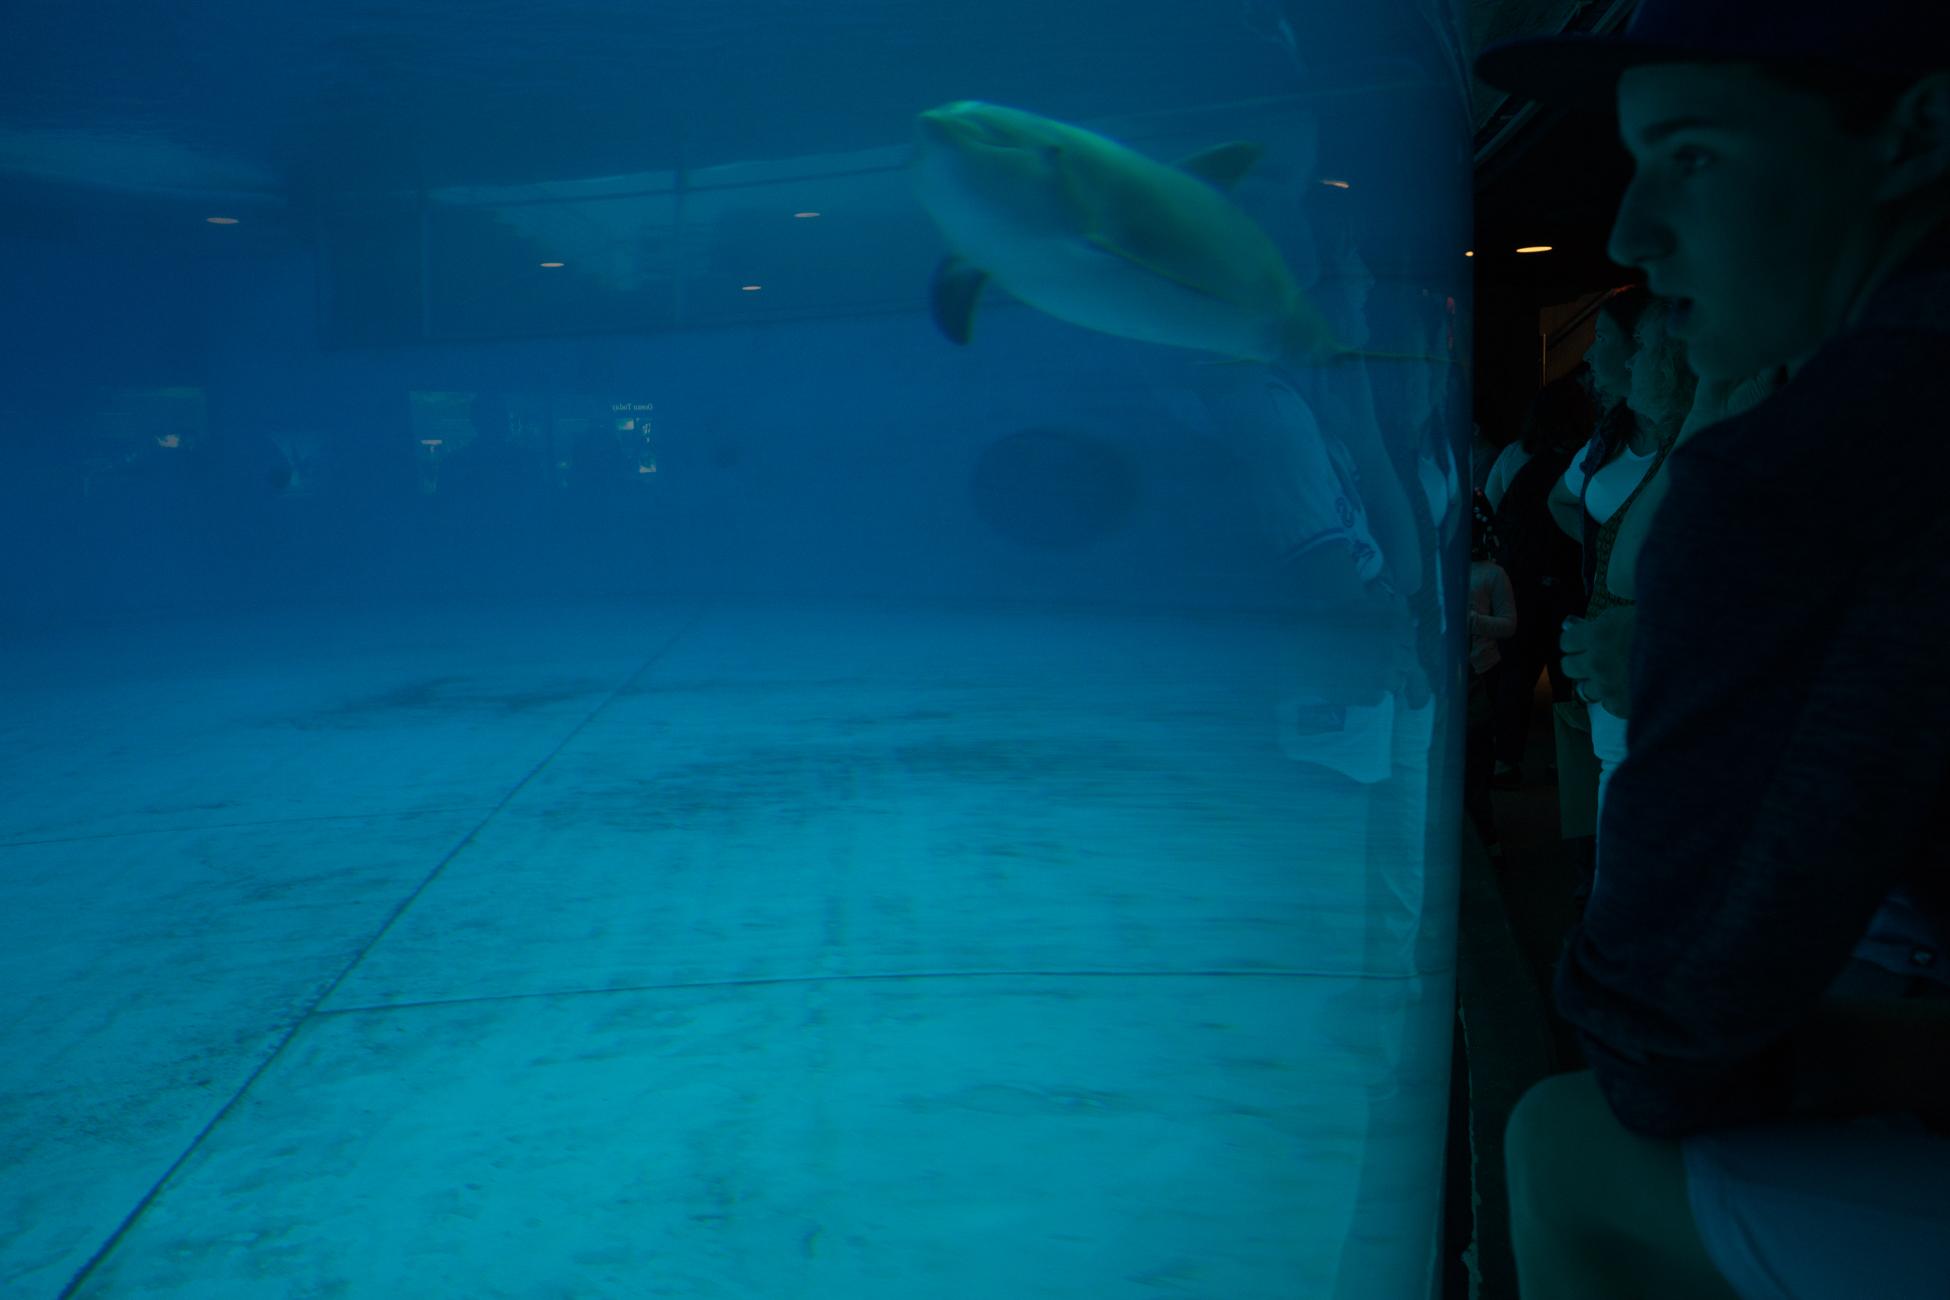 Baltimore Inner Harbor and National Aquarium (c) My3GirlsPhotography May 2017-4.jpg